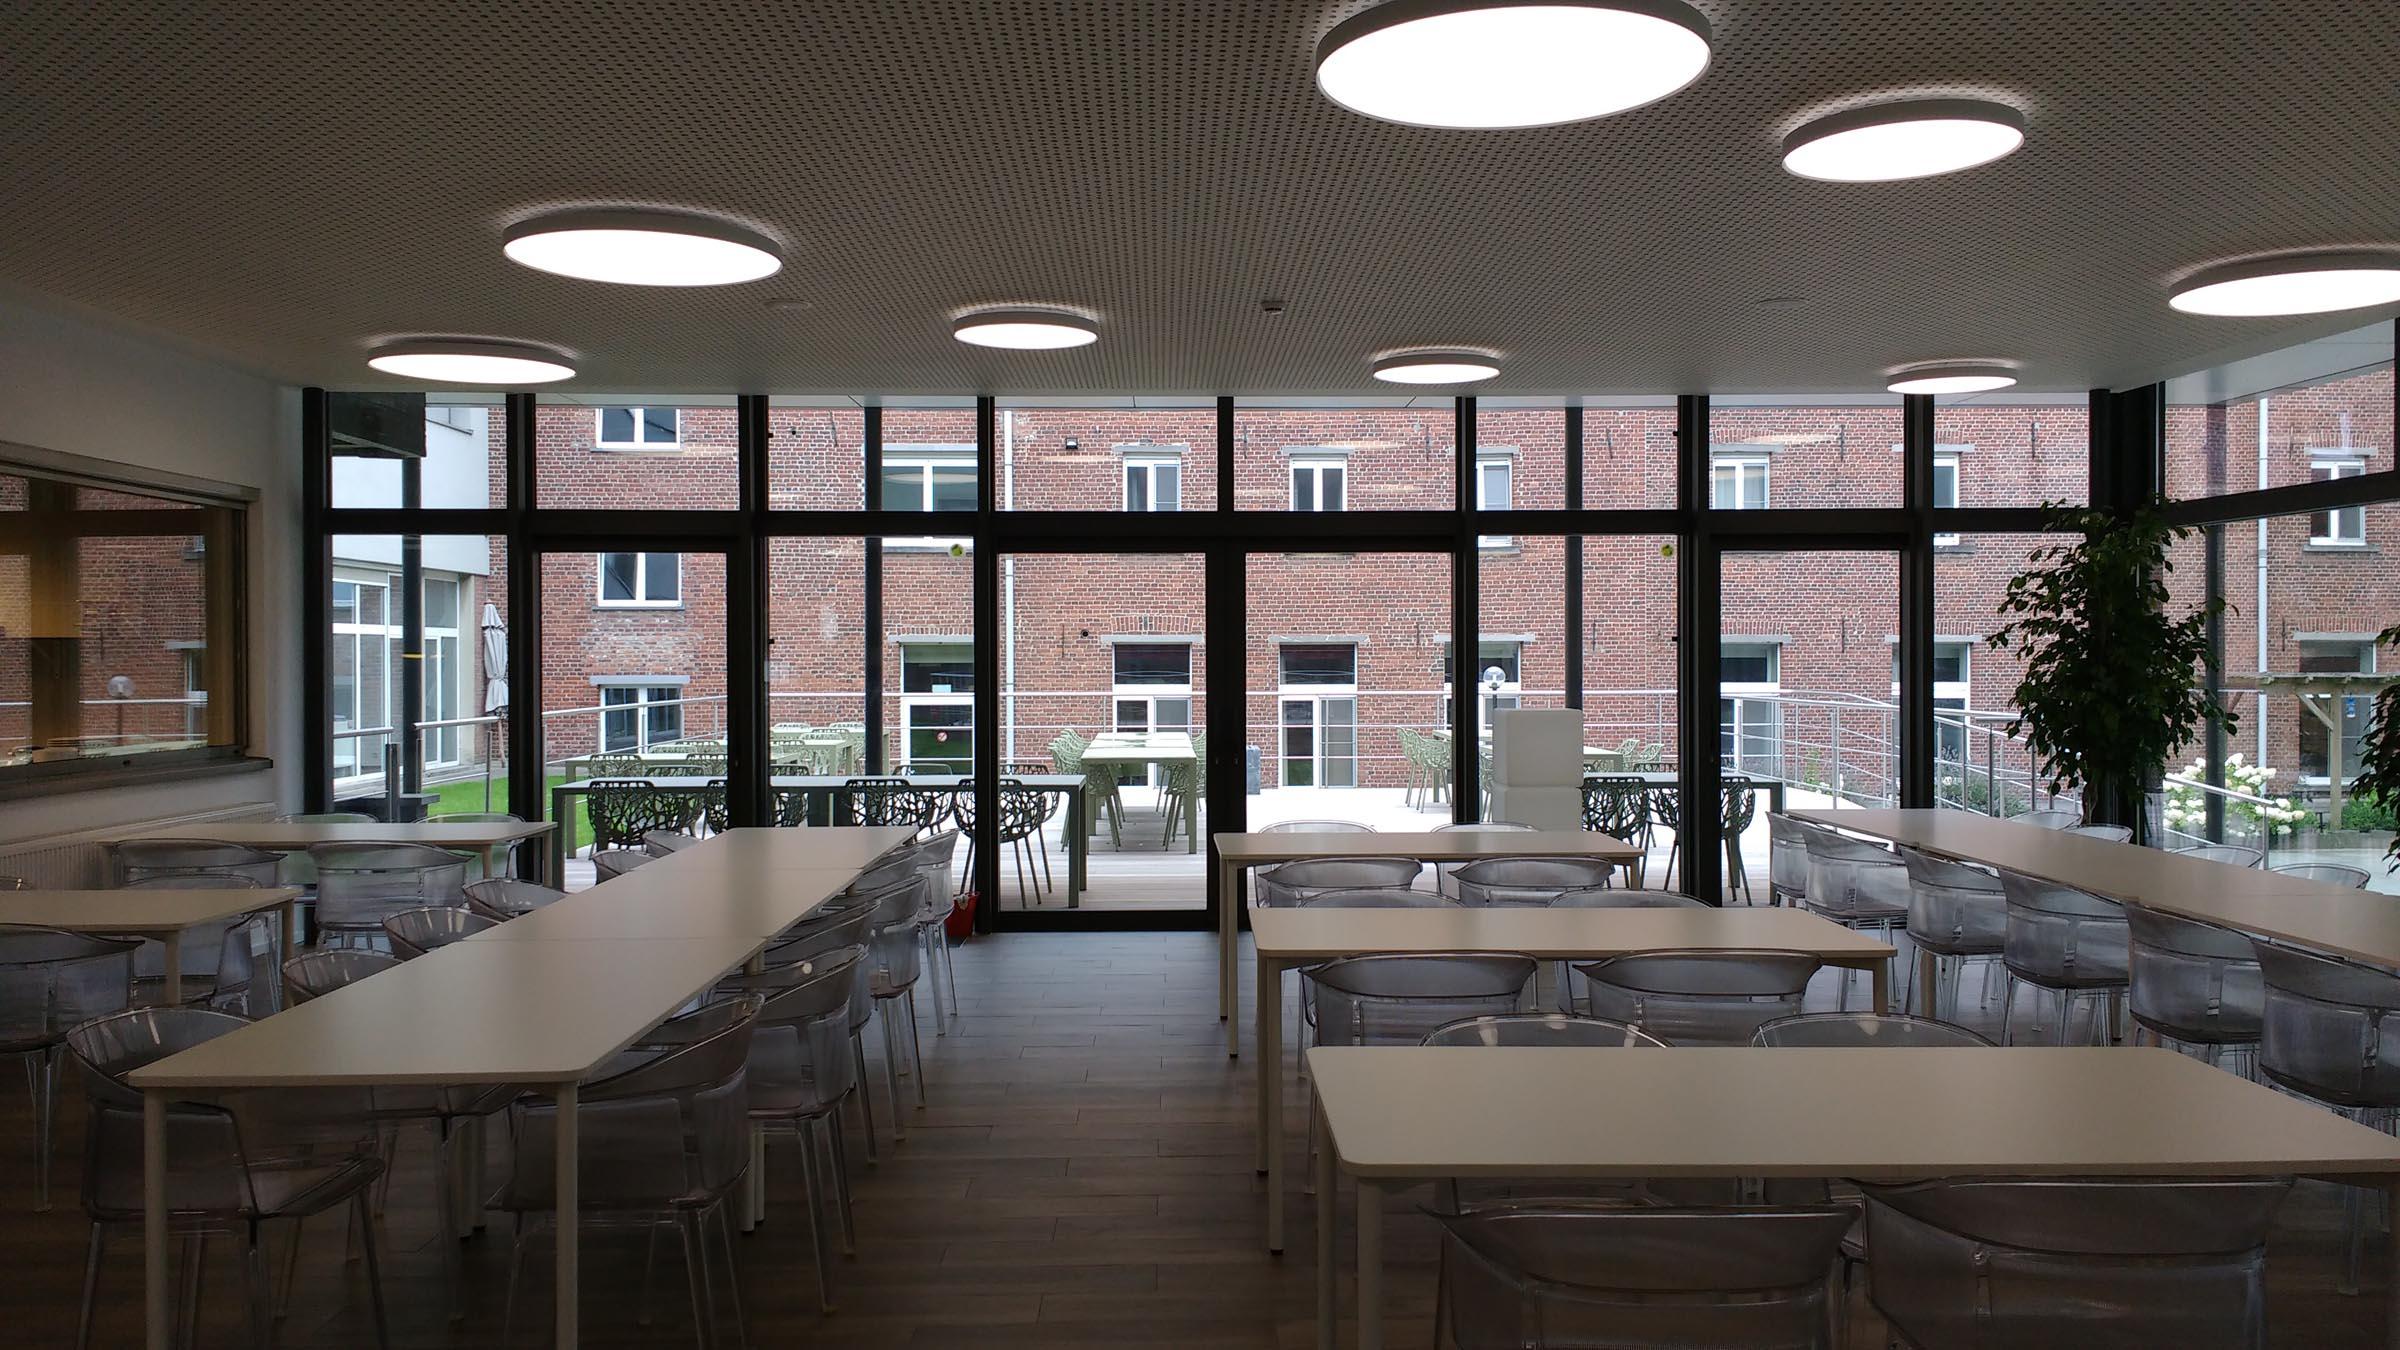 Dagverblijfcentrum Zonnestraal - Zaal